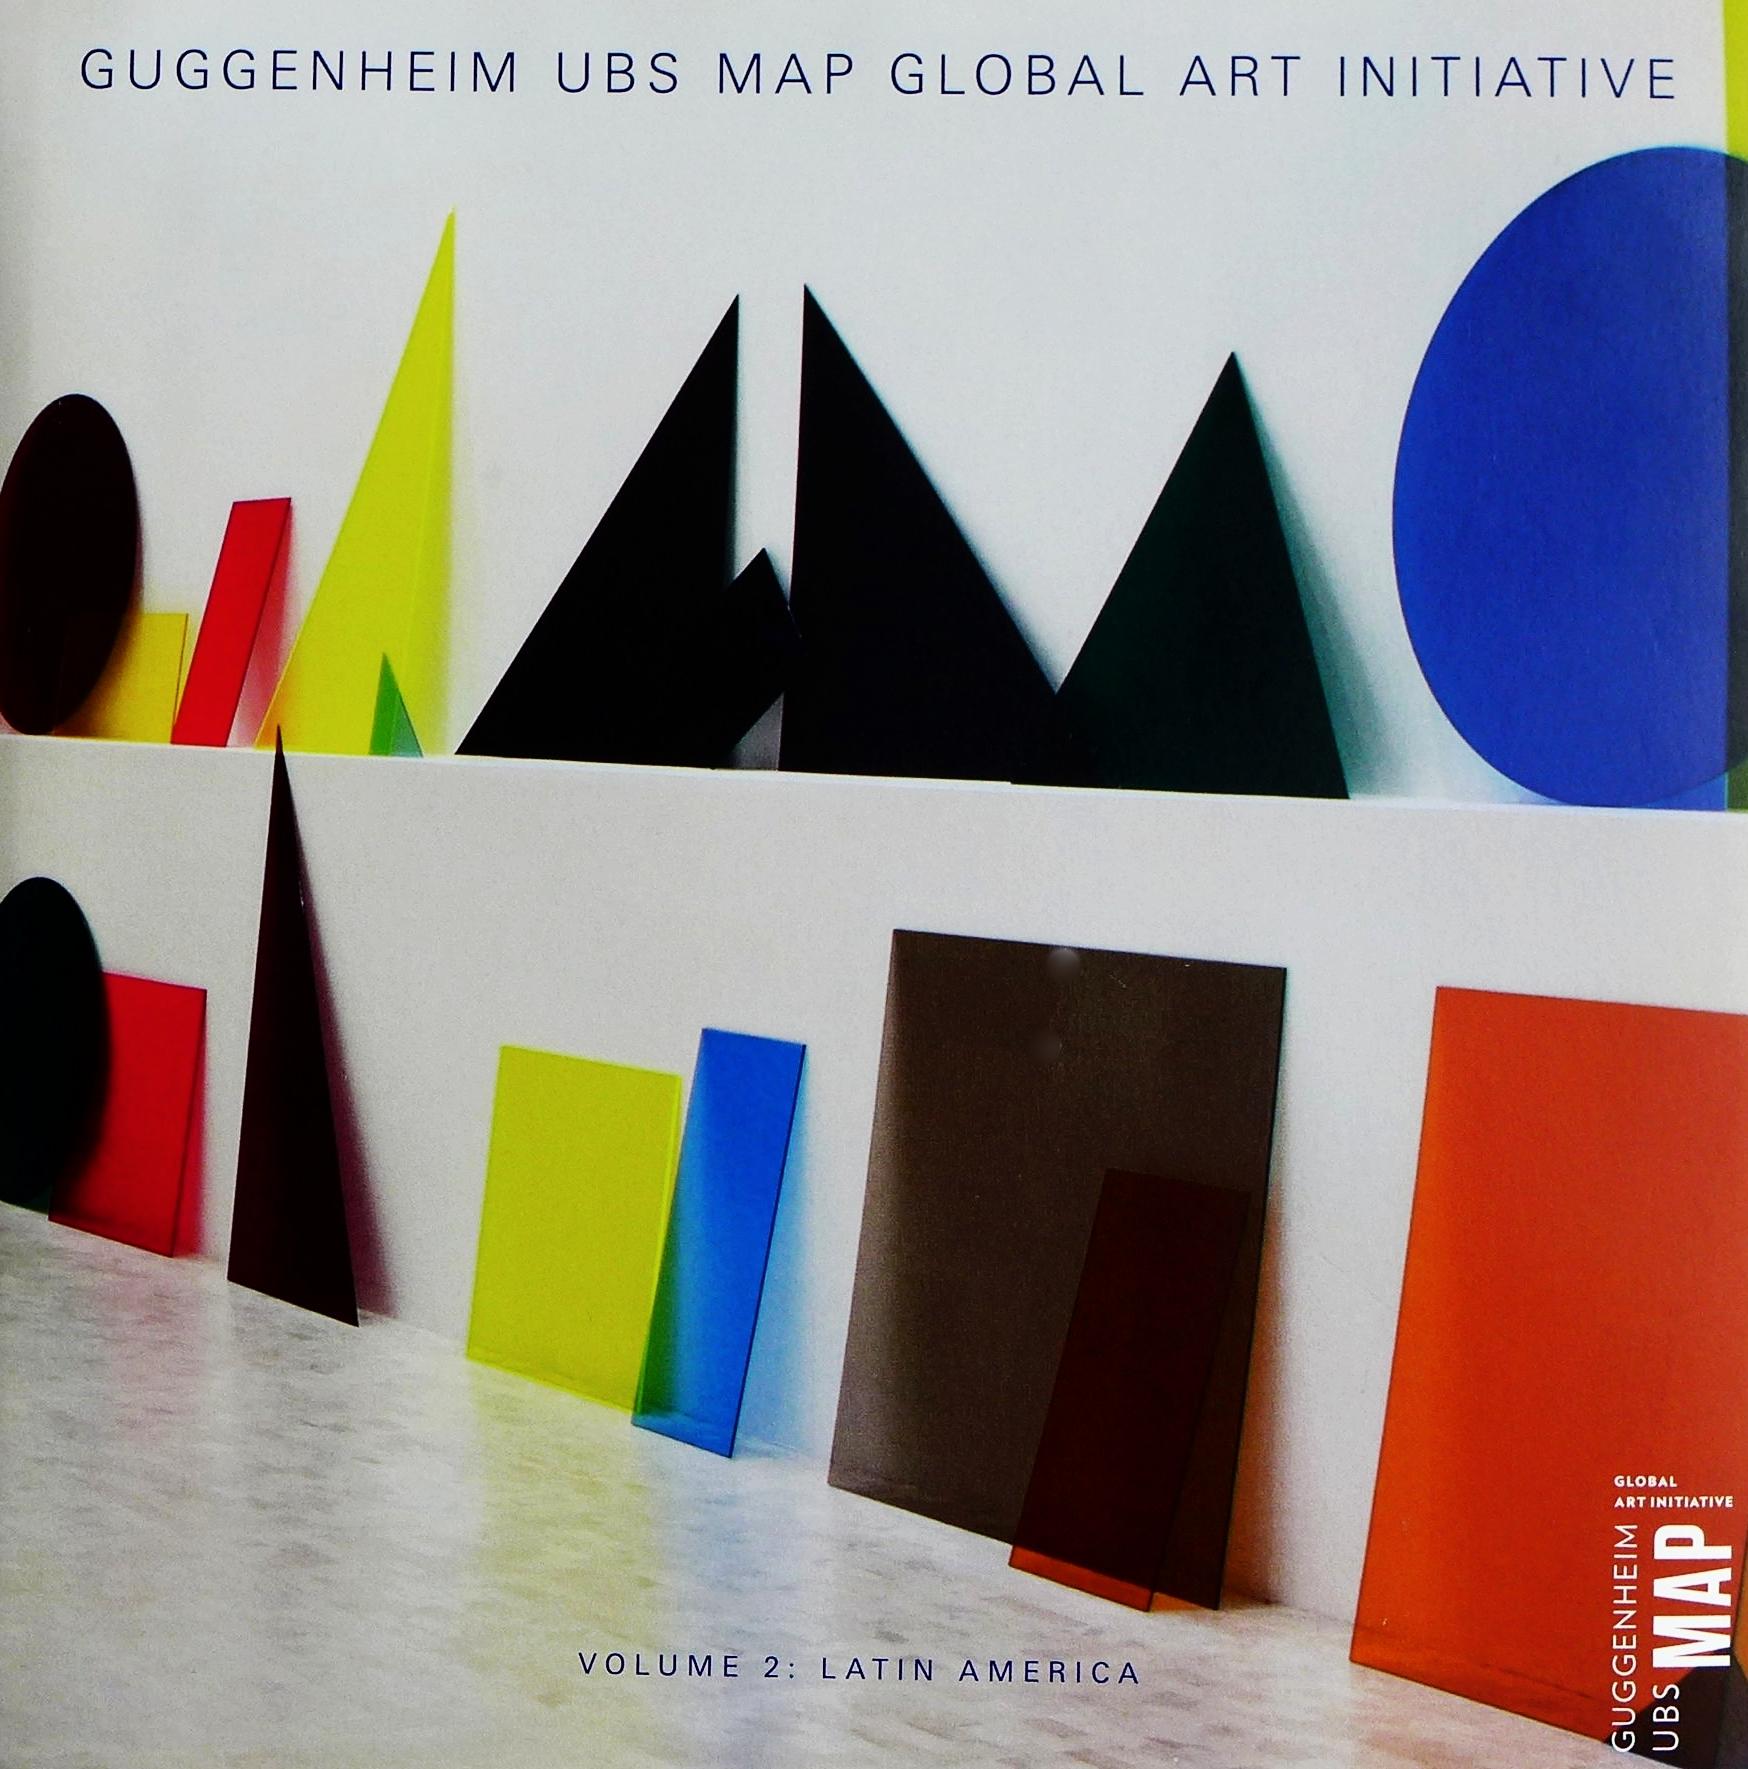 Guggenheim UBS Map Global Art Initiative. Vol. 2: Latin America  Guggenheim Museum ISBN: 978-0-89207-520-1